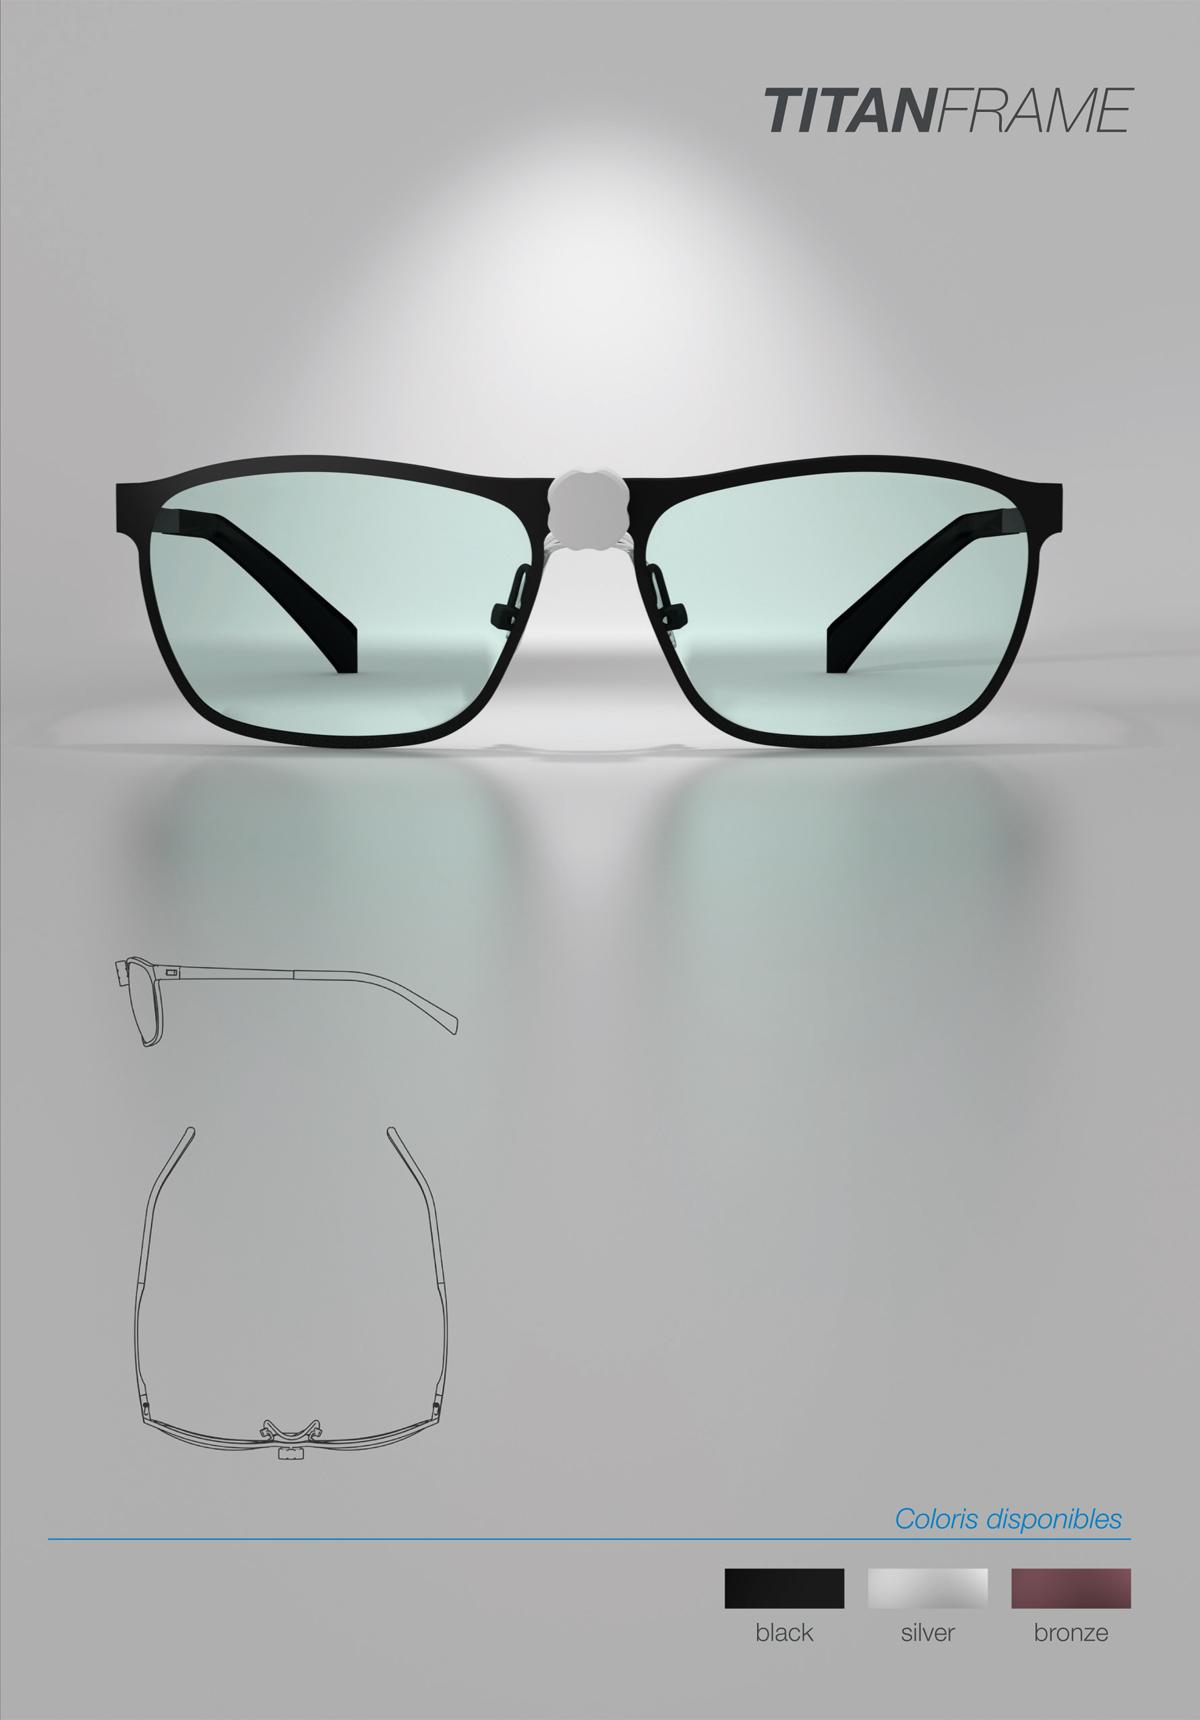 3MC-Concept - I.C.Lercher - Montures Titan Frame 2021 - Copyright I.C.LErcher